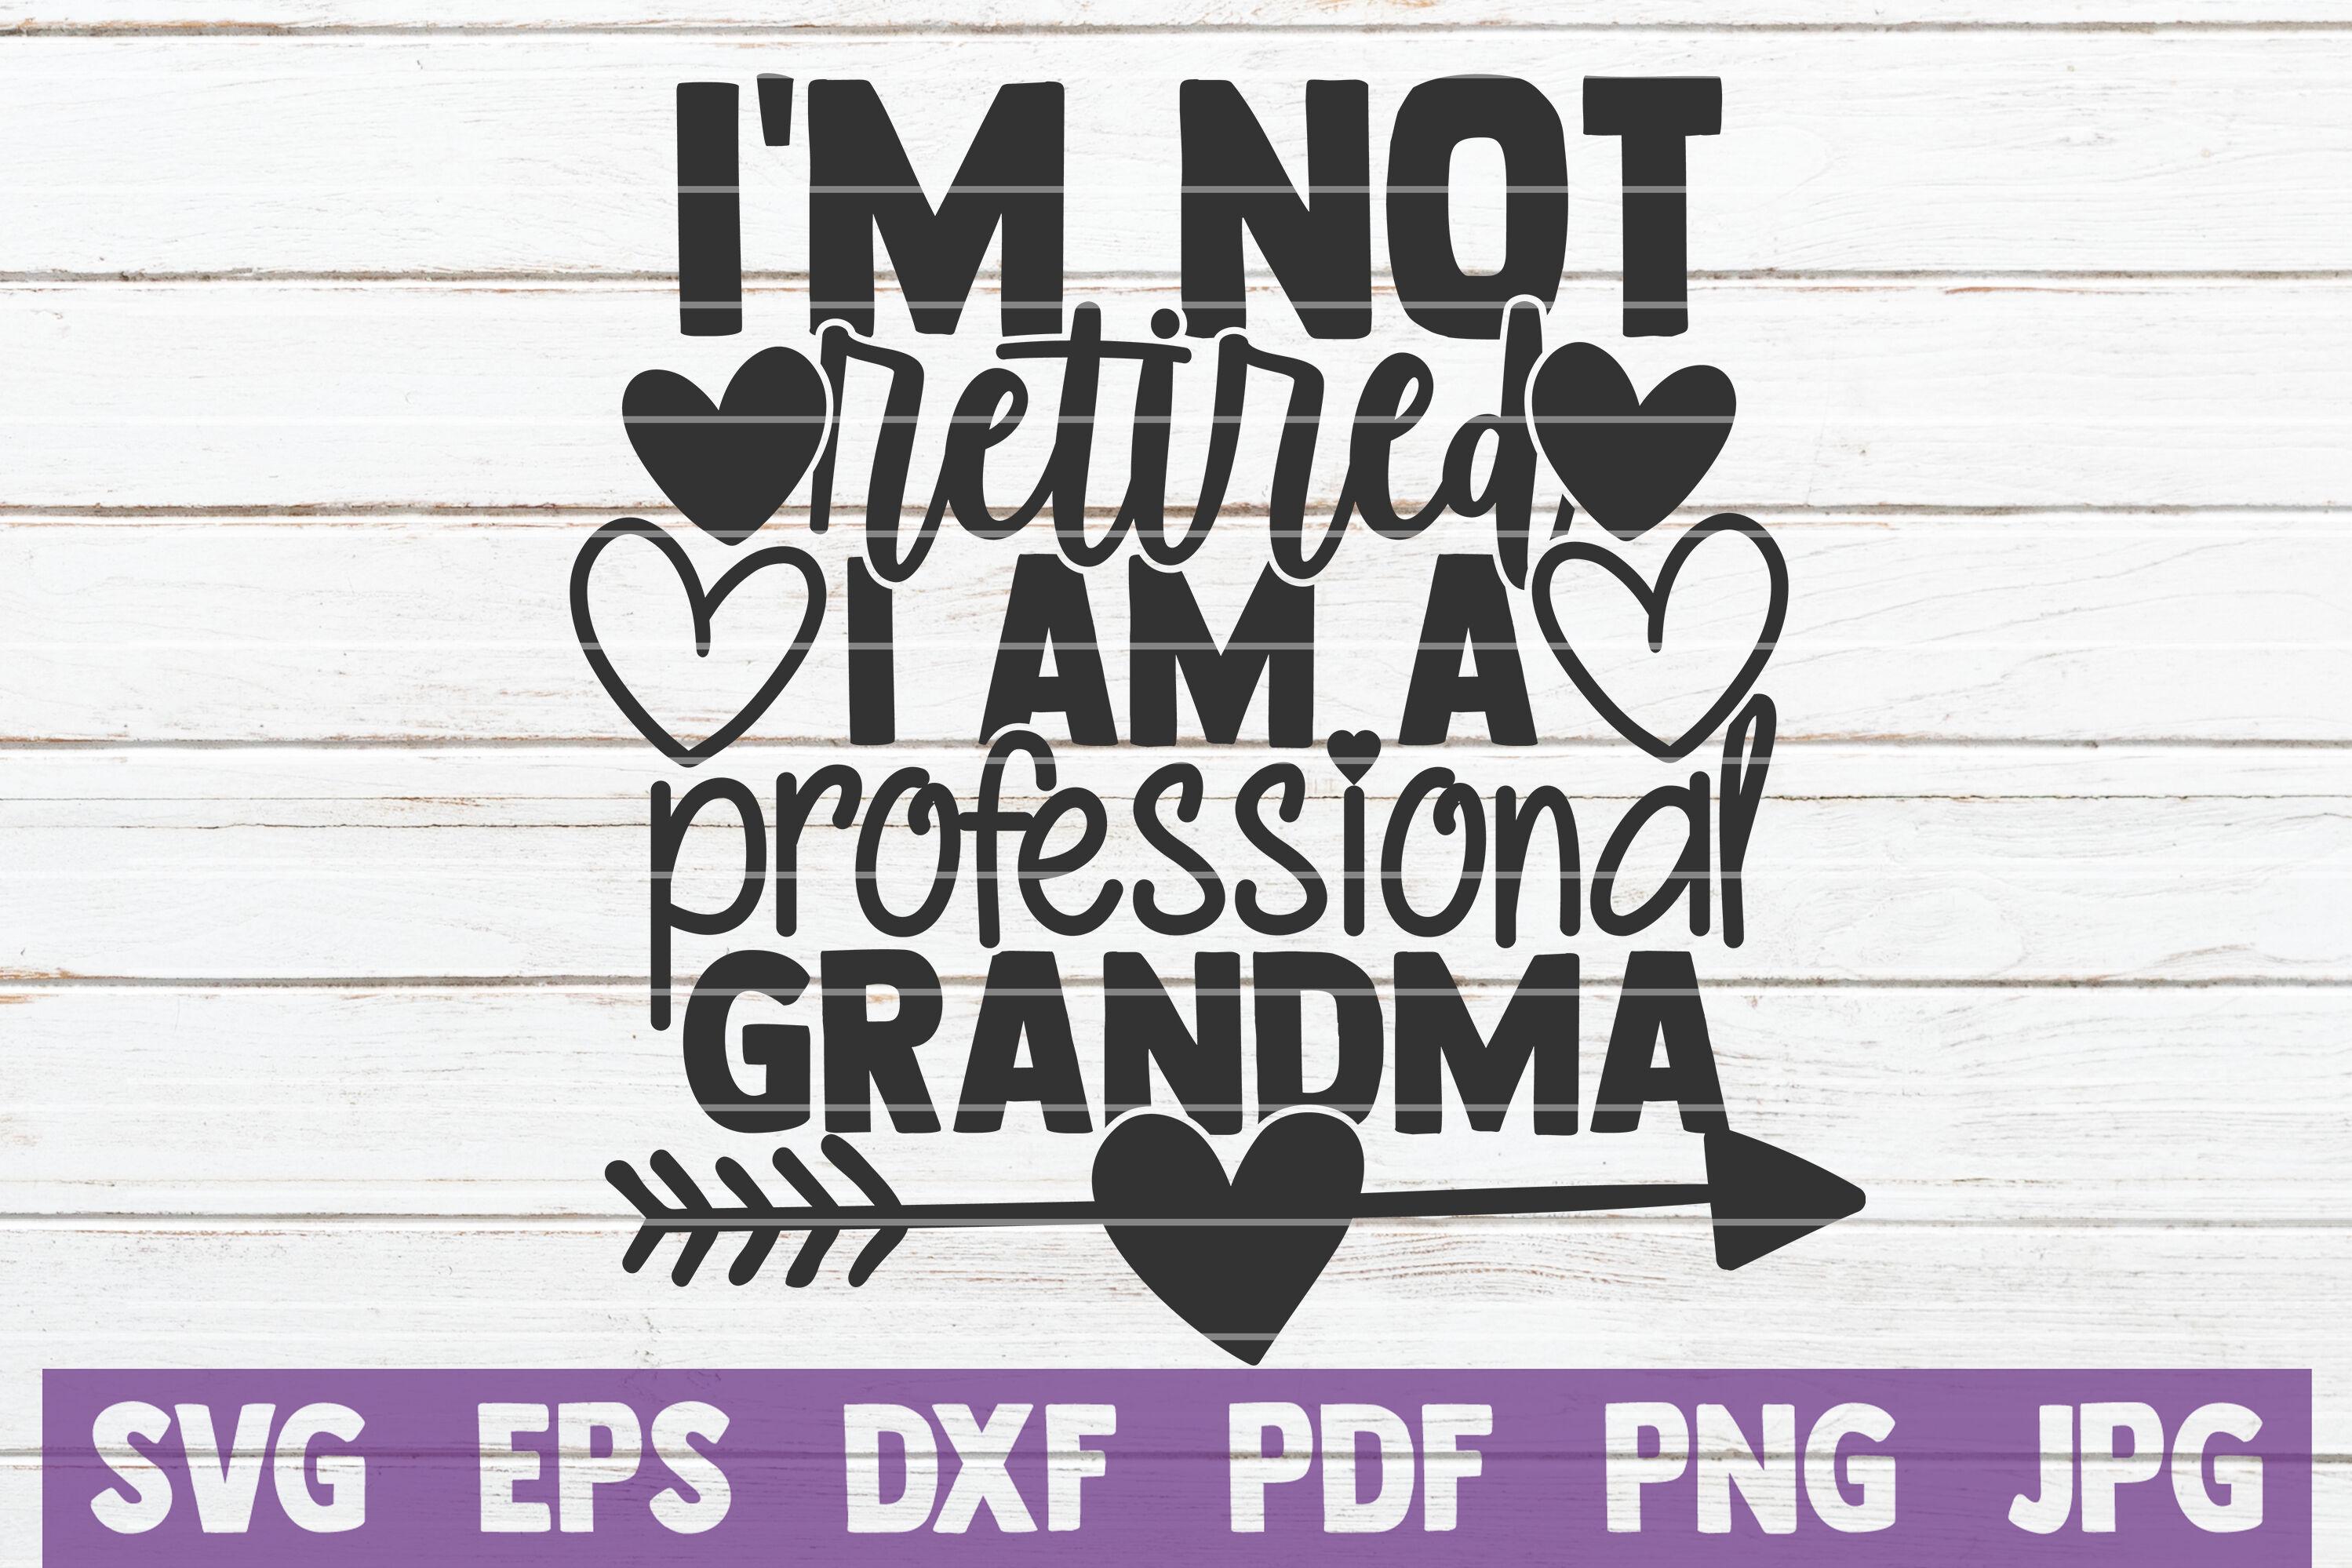 I M Not Retired I Am A Professional Grandma Svg Cut File By